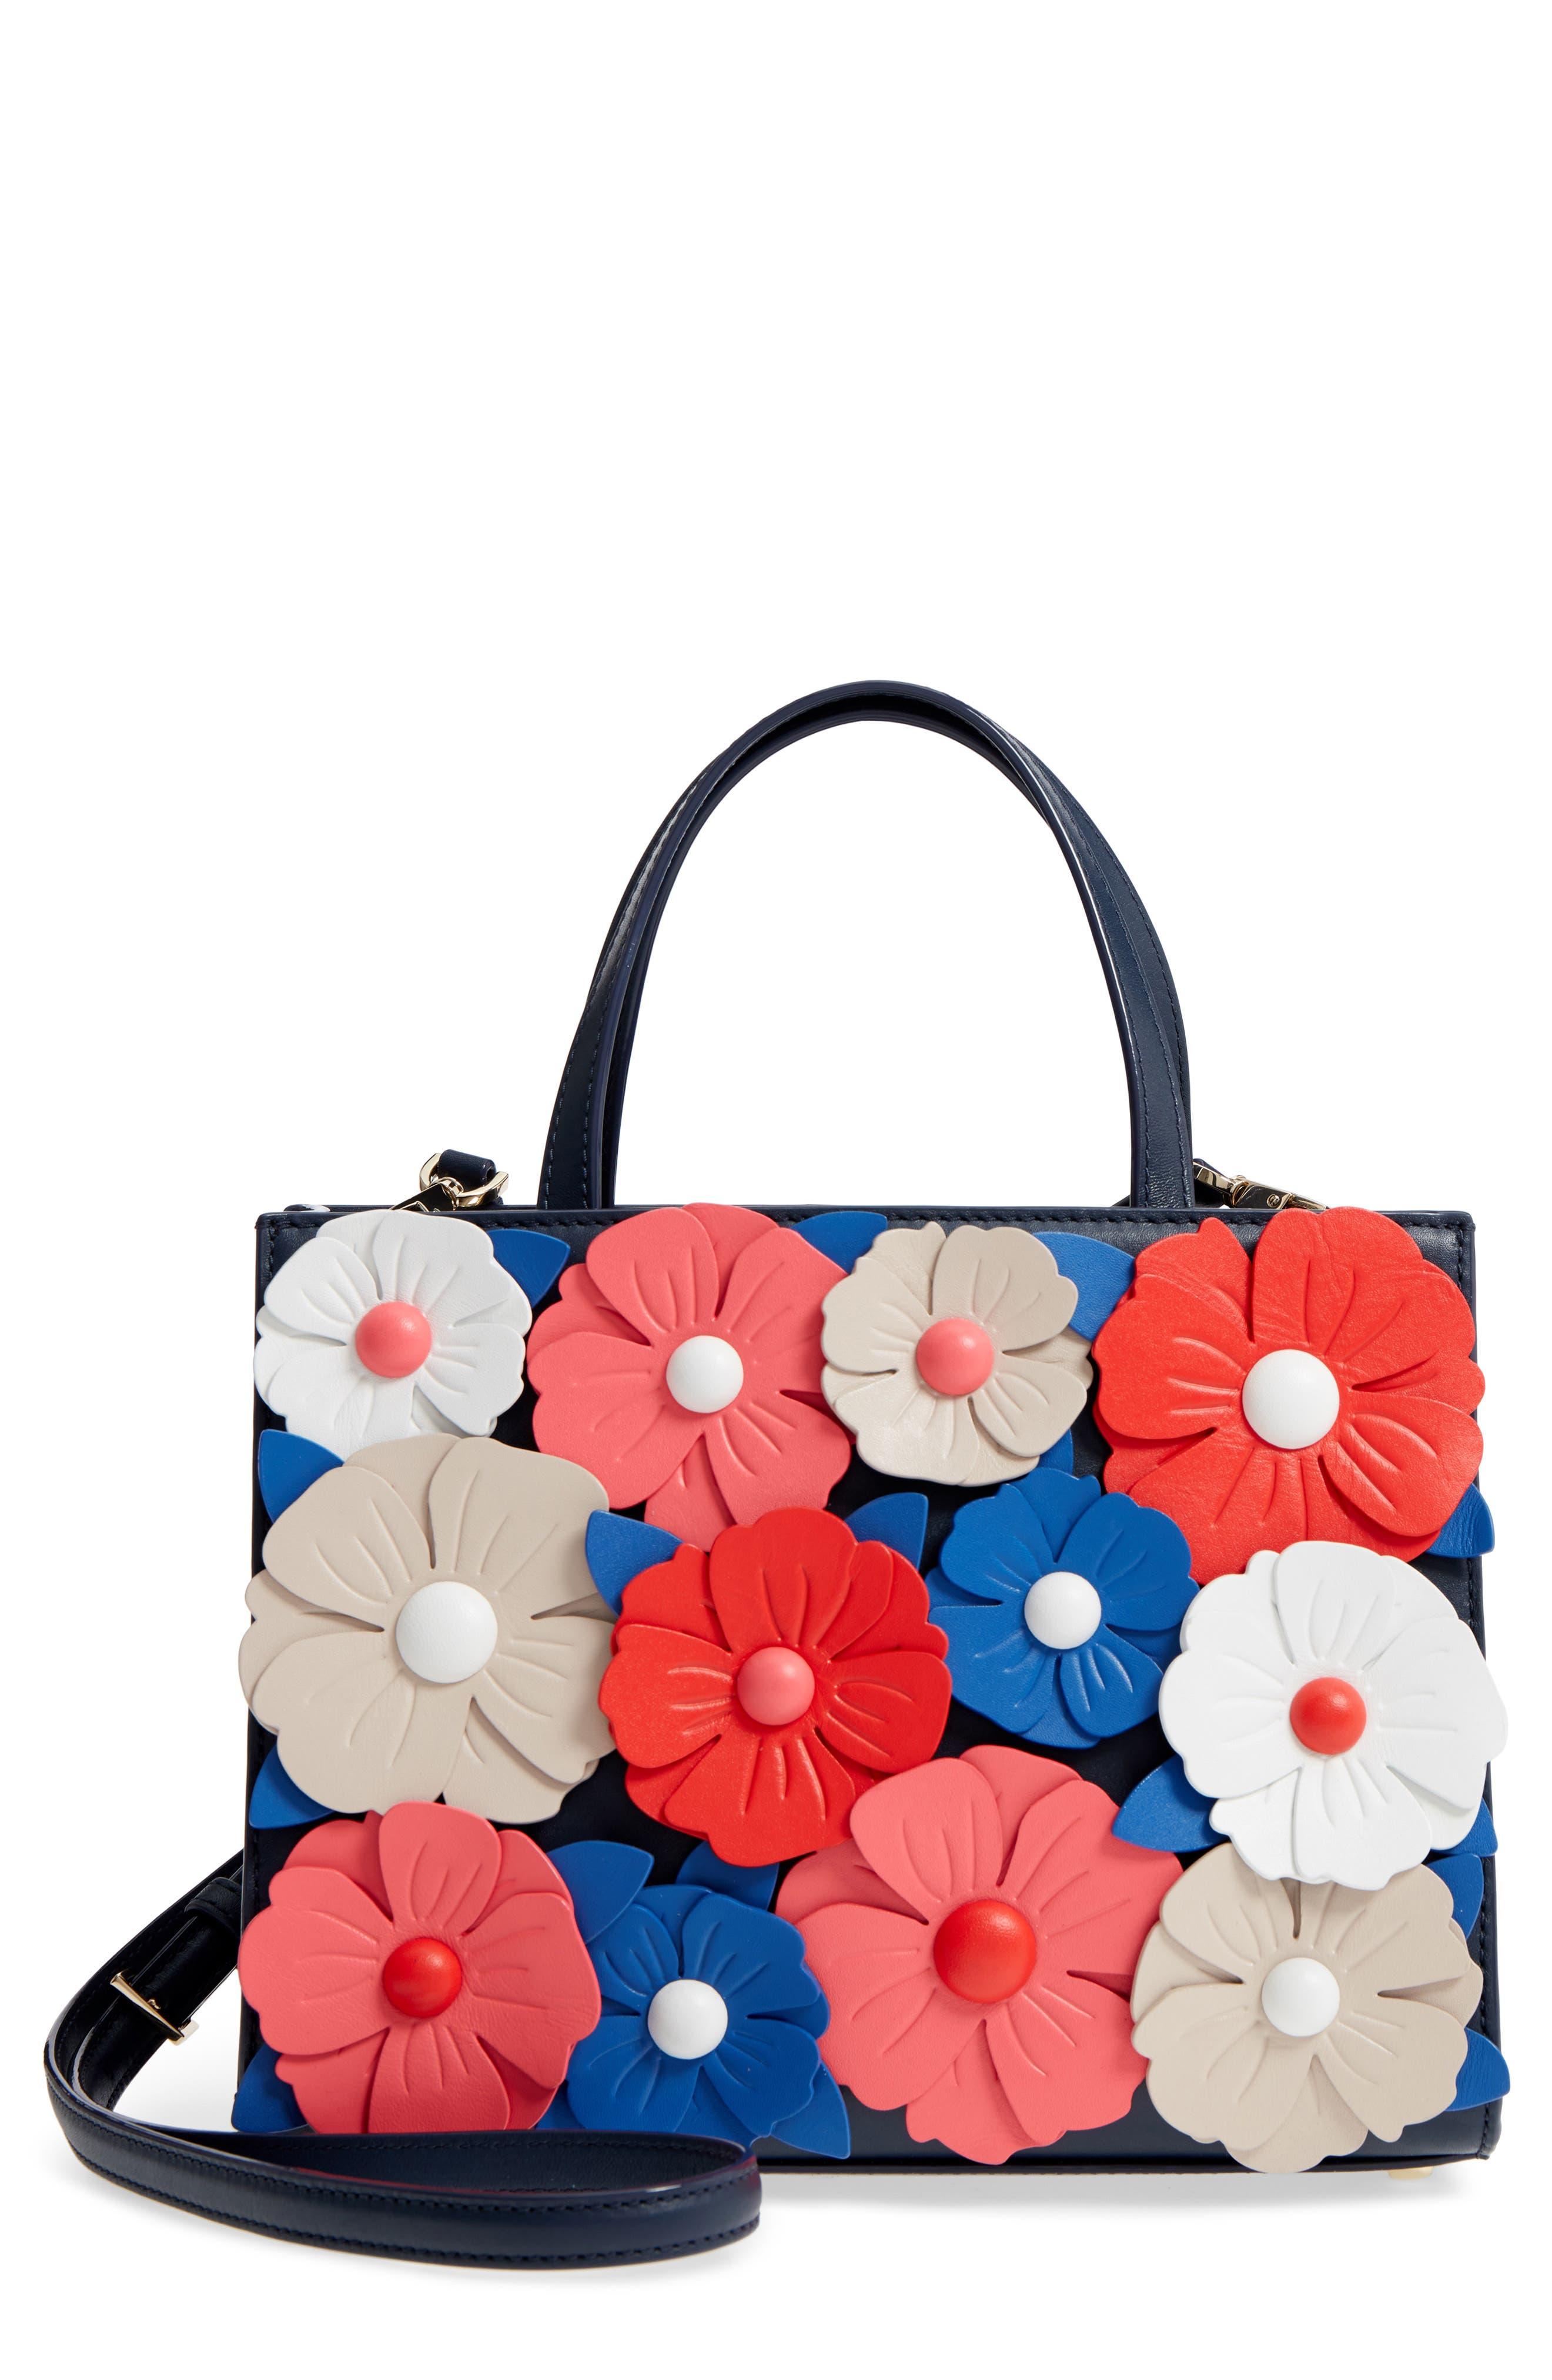 madison daisy lane – sam leather handbag,                         Main,                         color, Blazer Blue Multi